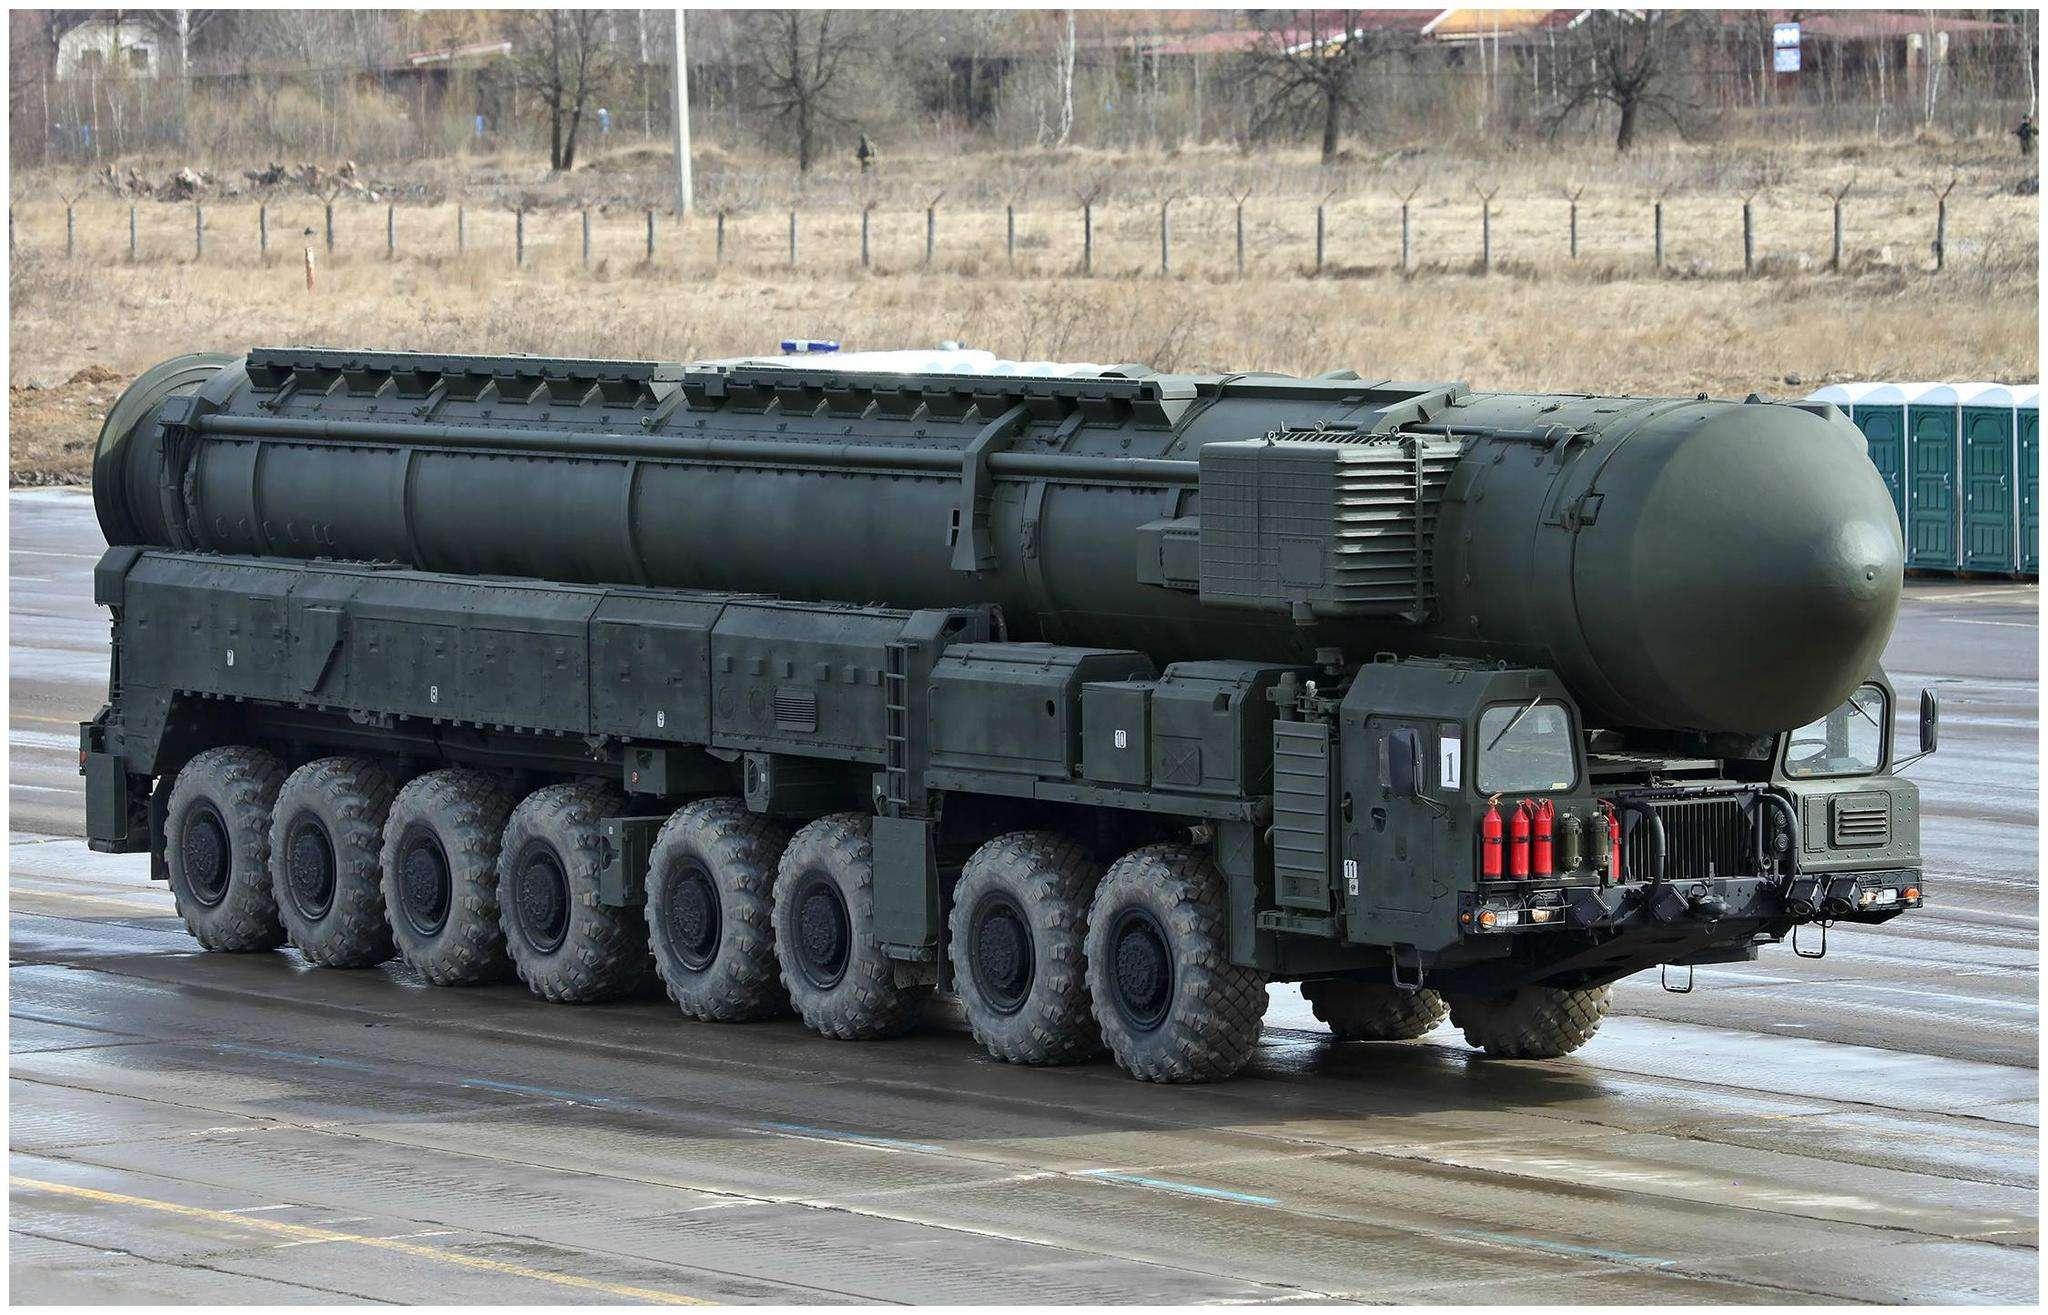 洲际导弹的射程最远是多少,ä¸ºä½•å§‹ç»ˆæ²¡èƒ½çªç ´2万公里